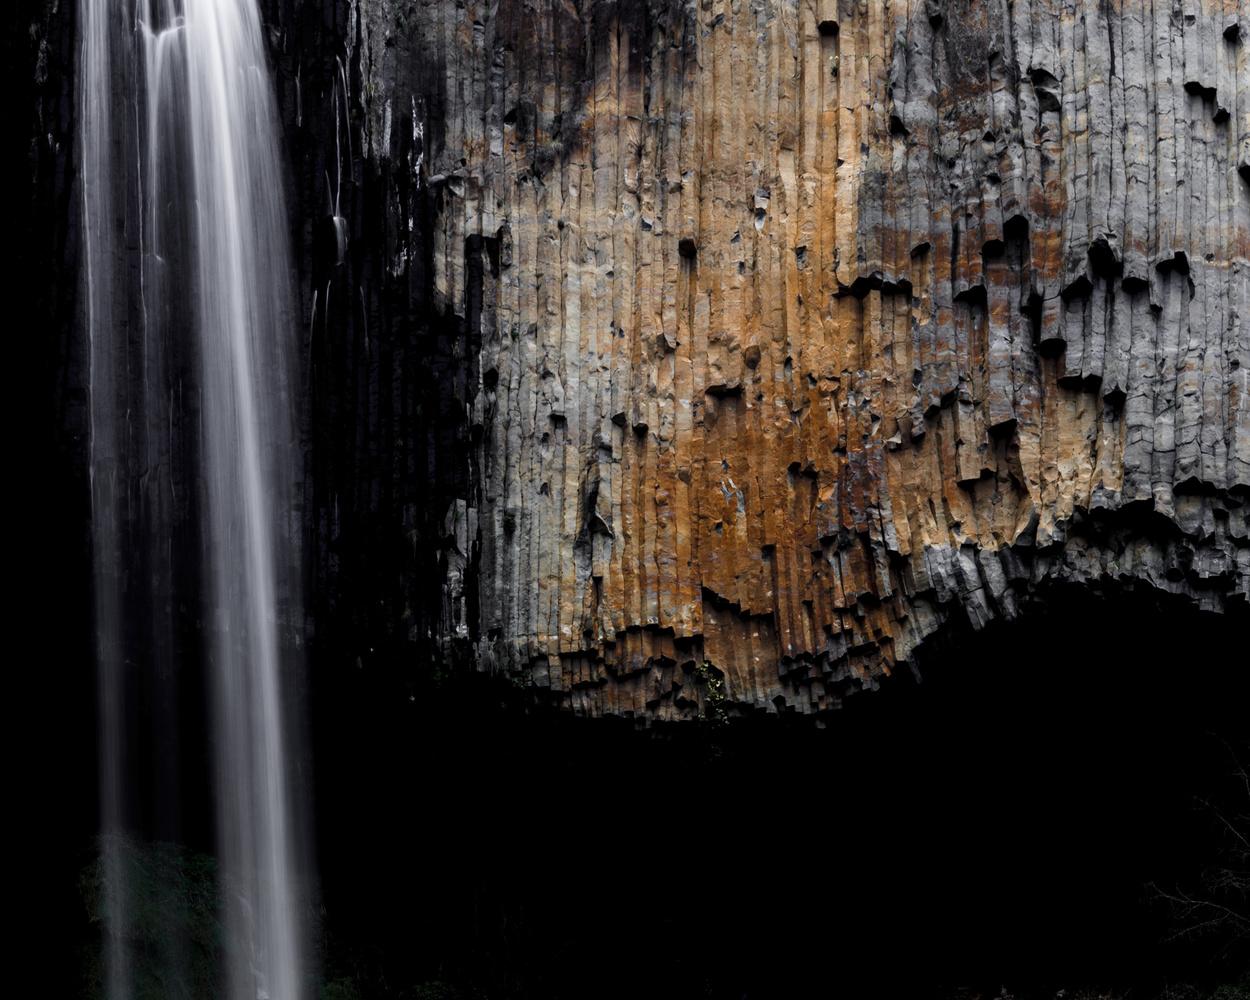 Waterfall of Pourcheyrolles by david huguet